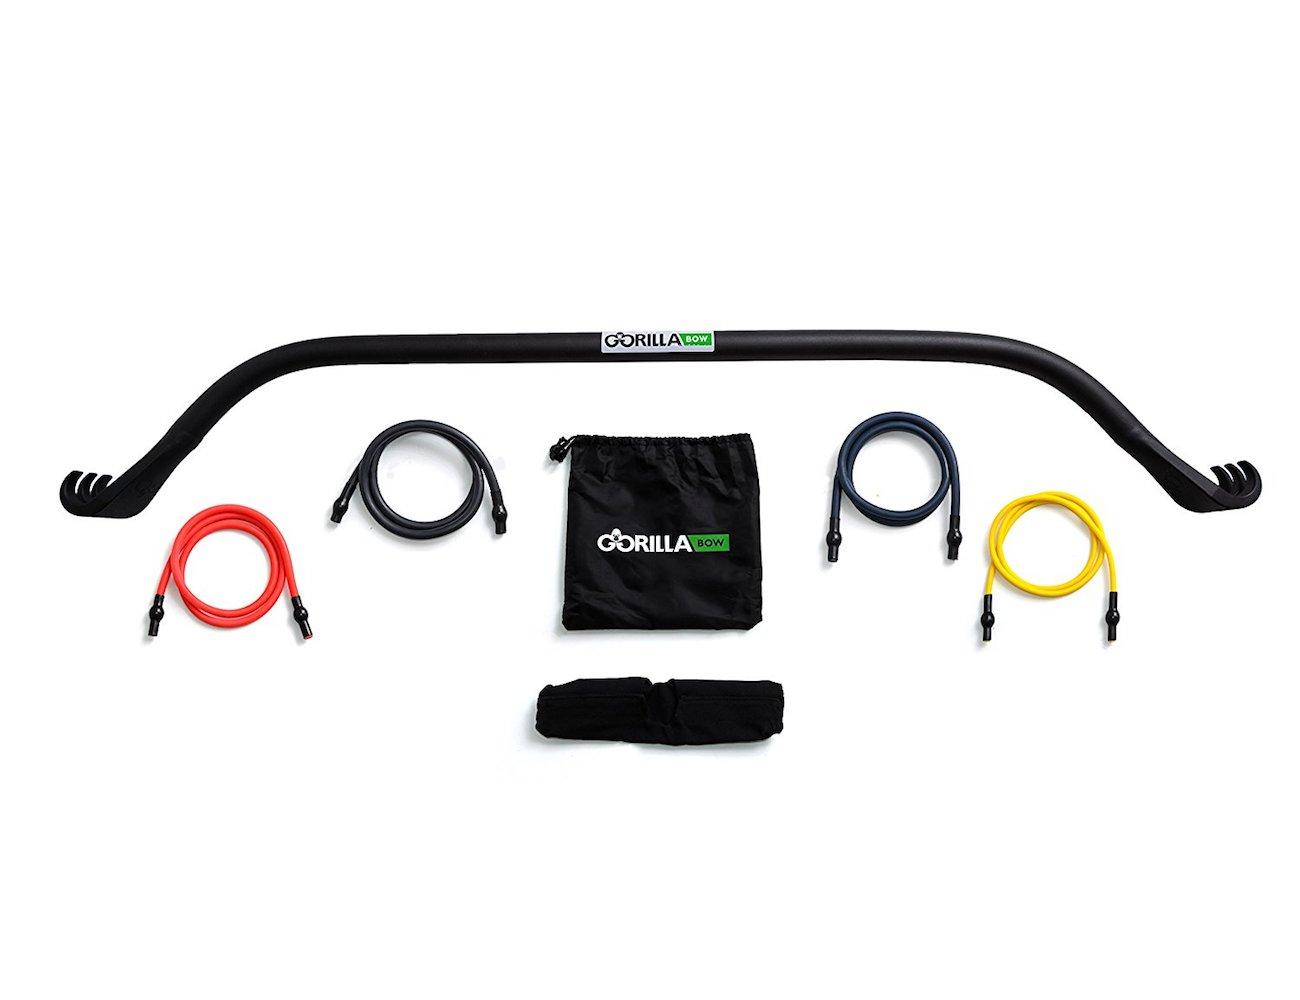 Gorilla Bow Portable Resistance Training Kit